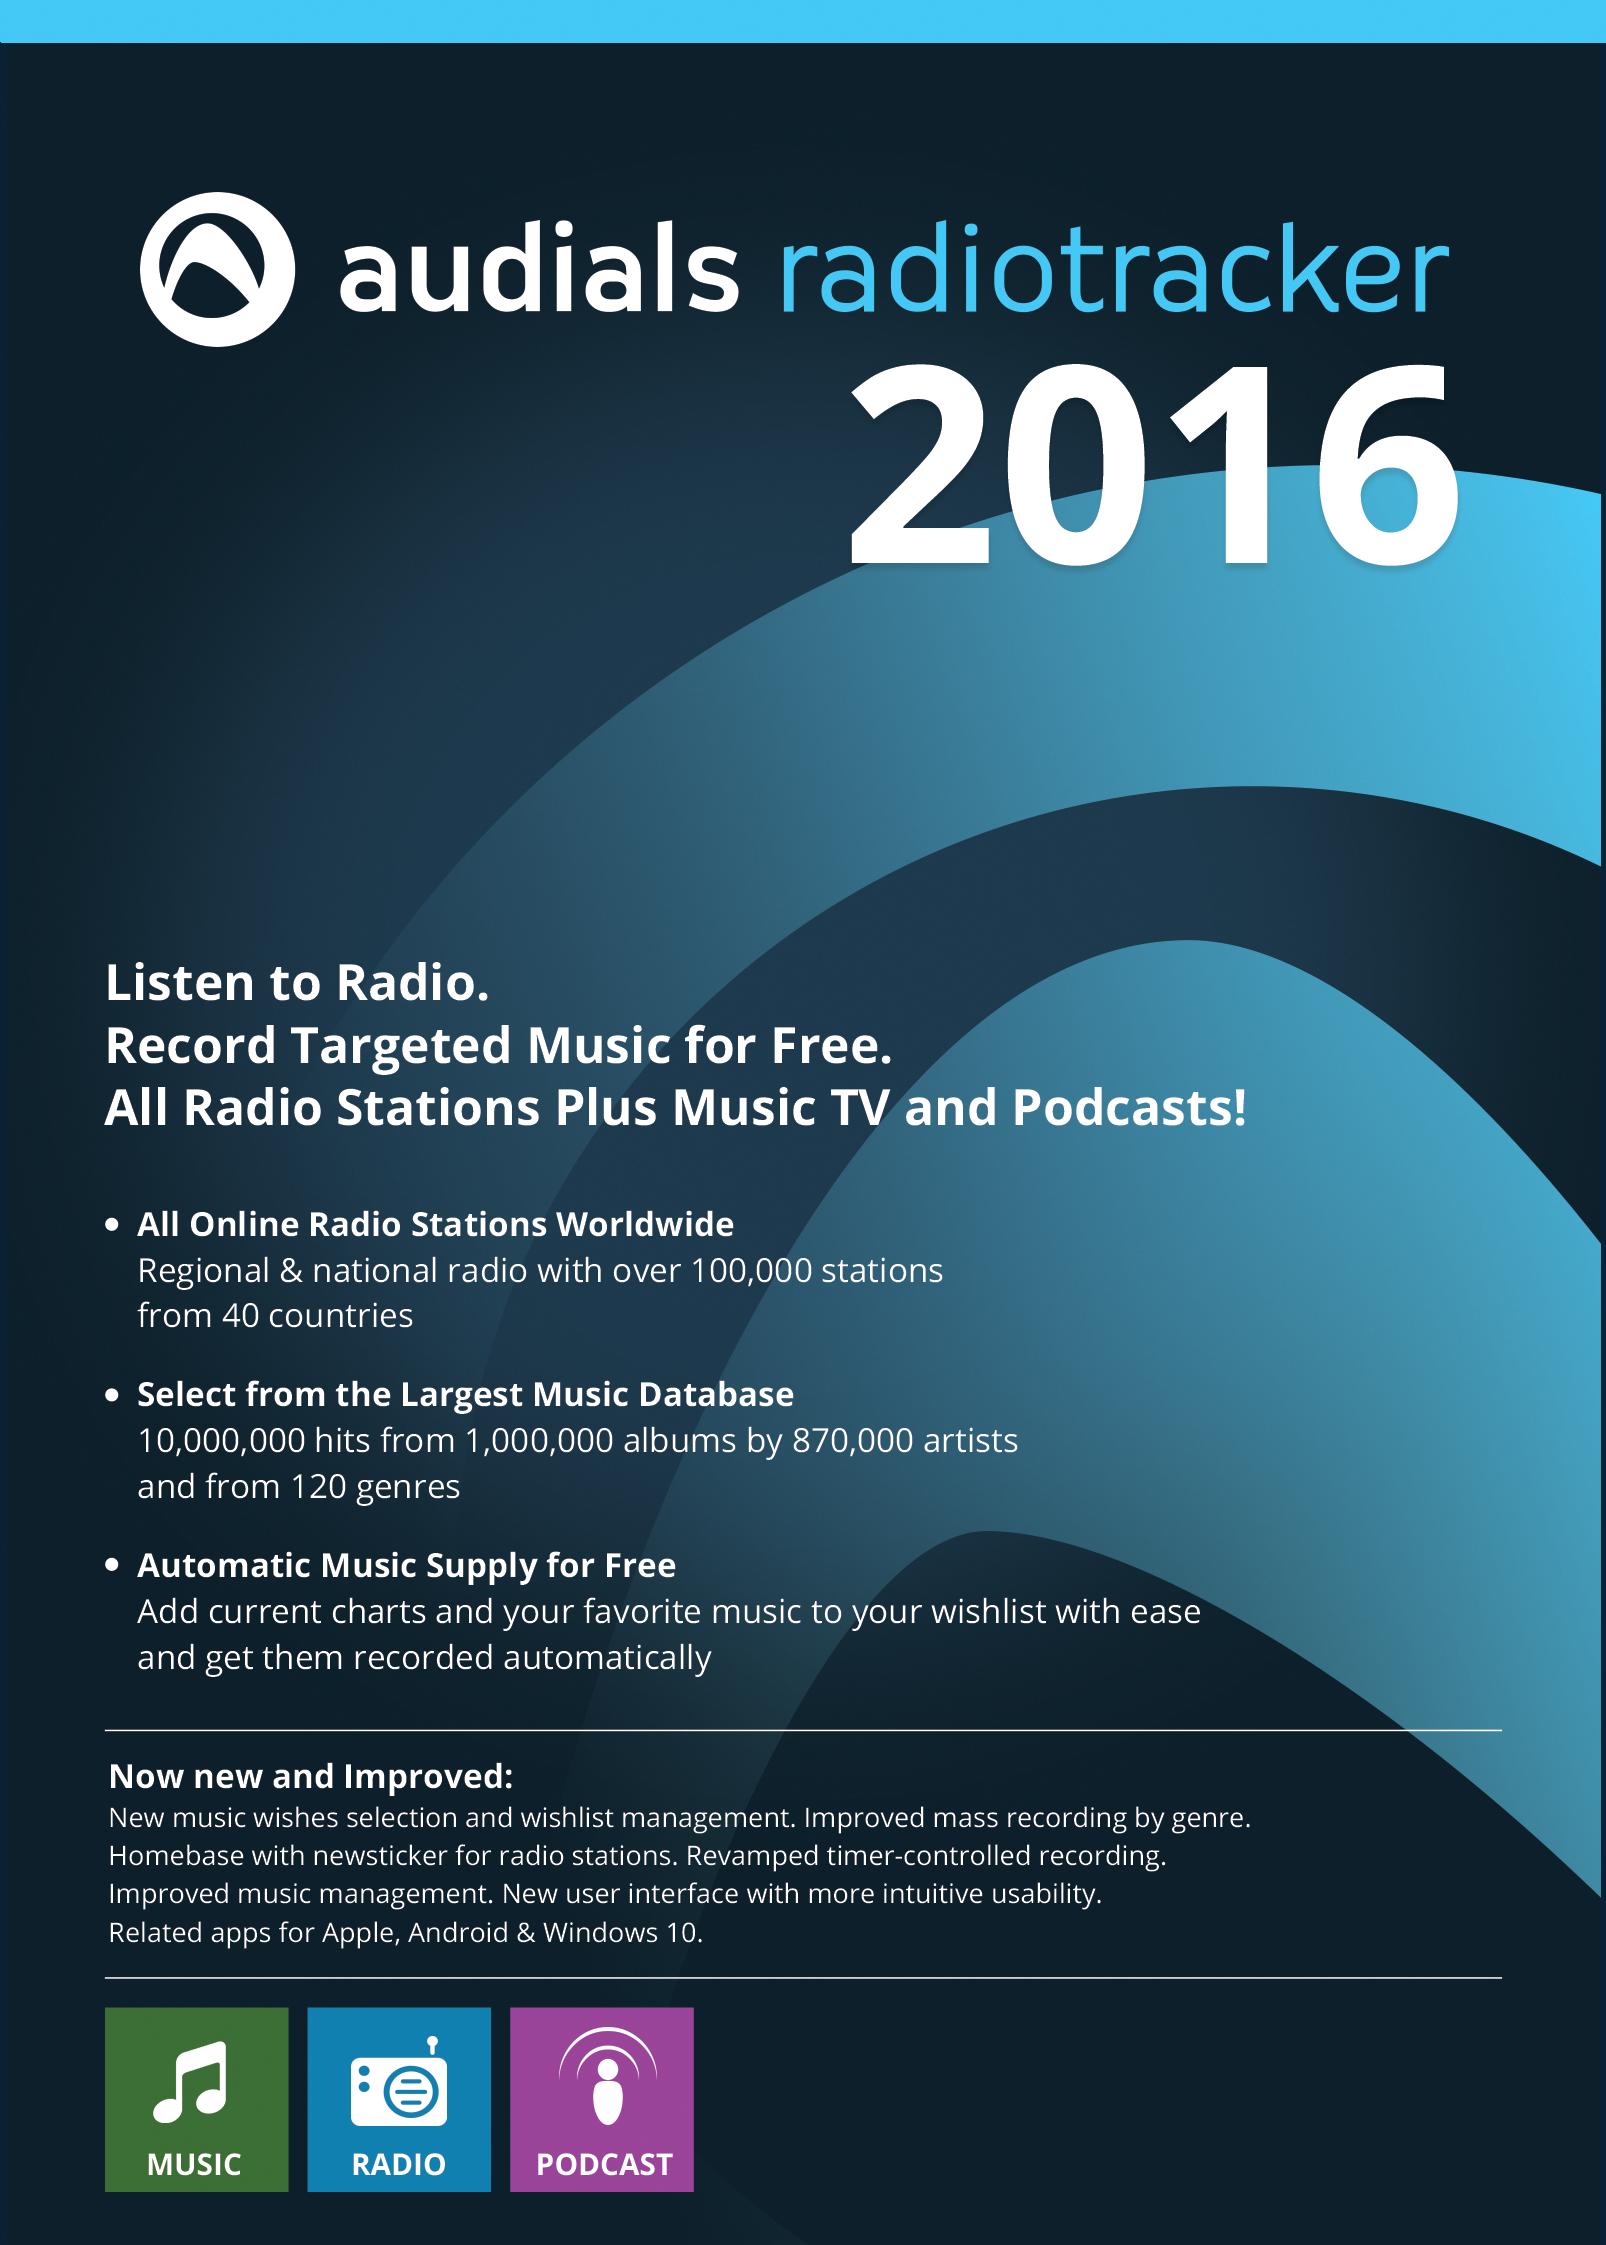 Audials Radiotracker 2016 [Download] (Best Id3 Tag Editor)